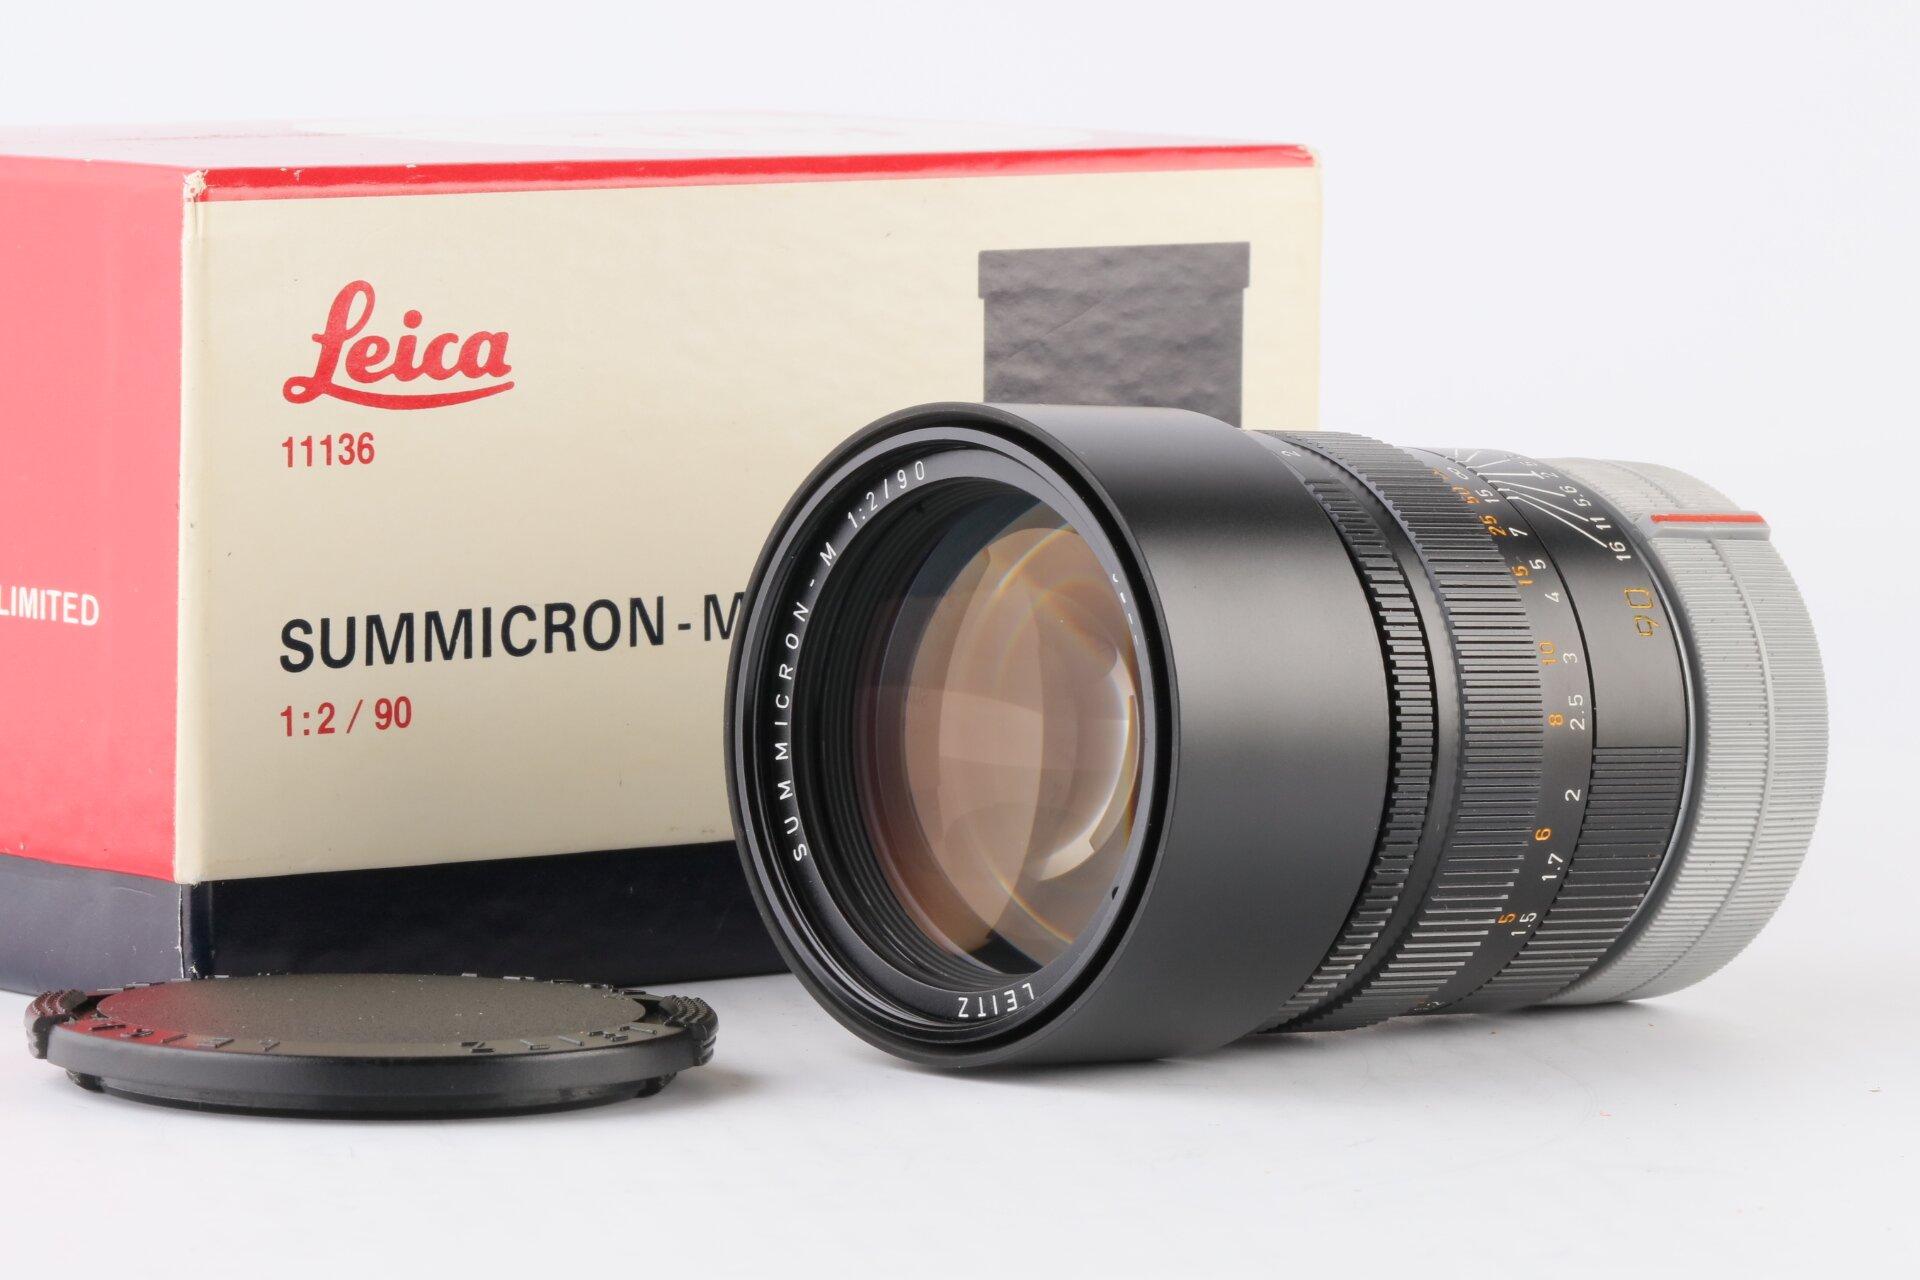 Leica M Summicron-M 2/90mm E55 11136